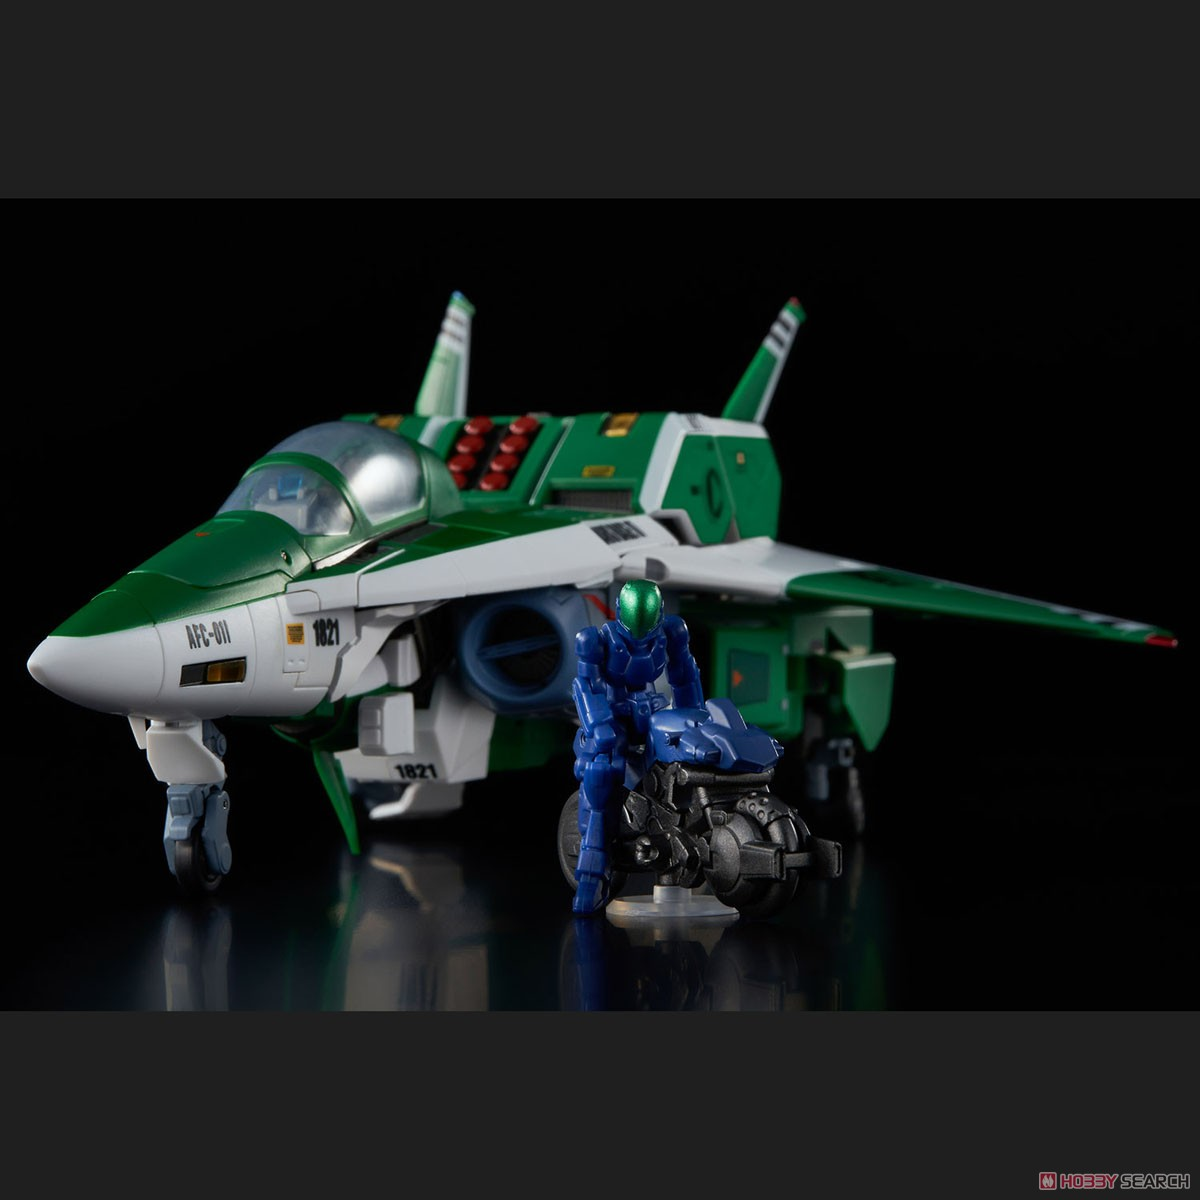 RIOBOT『AFC-01I レギオス・イオタ』機甲創世記モスピーダ 1/48 可変可動フィギュア-014